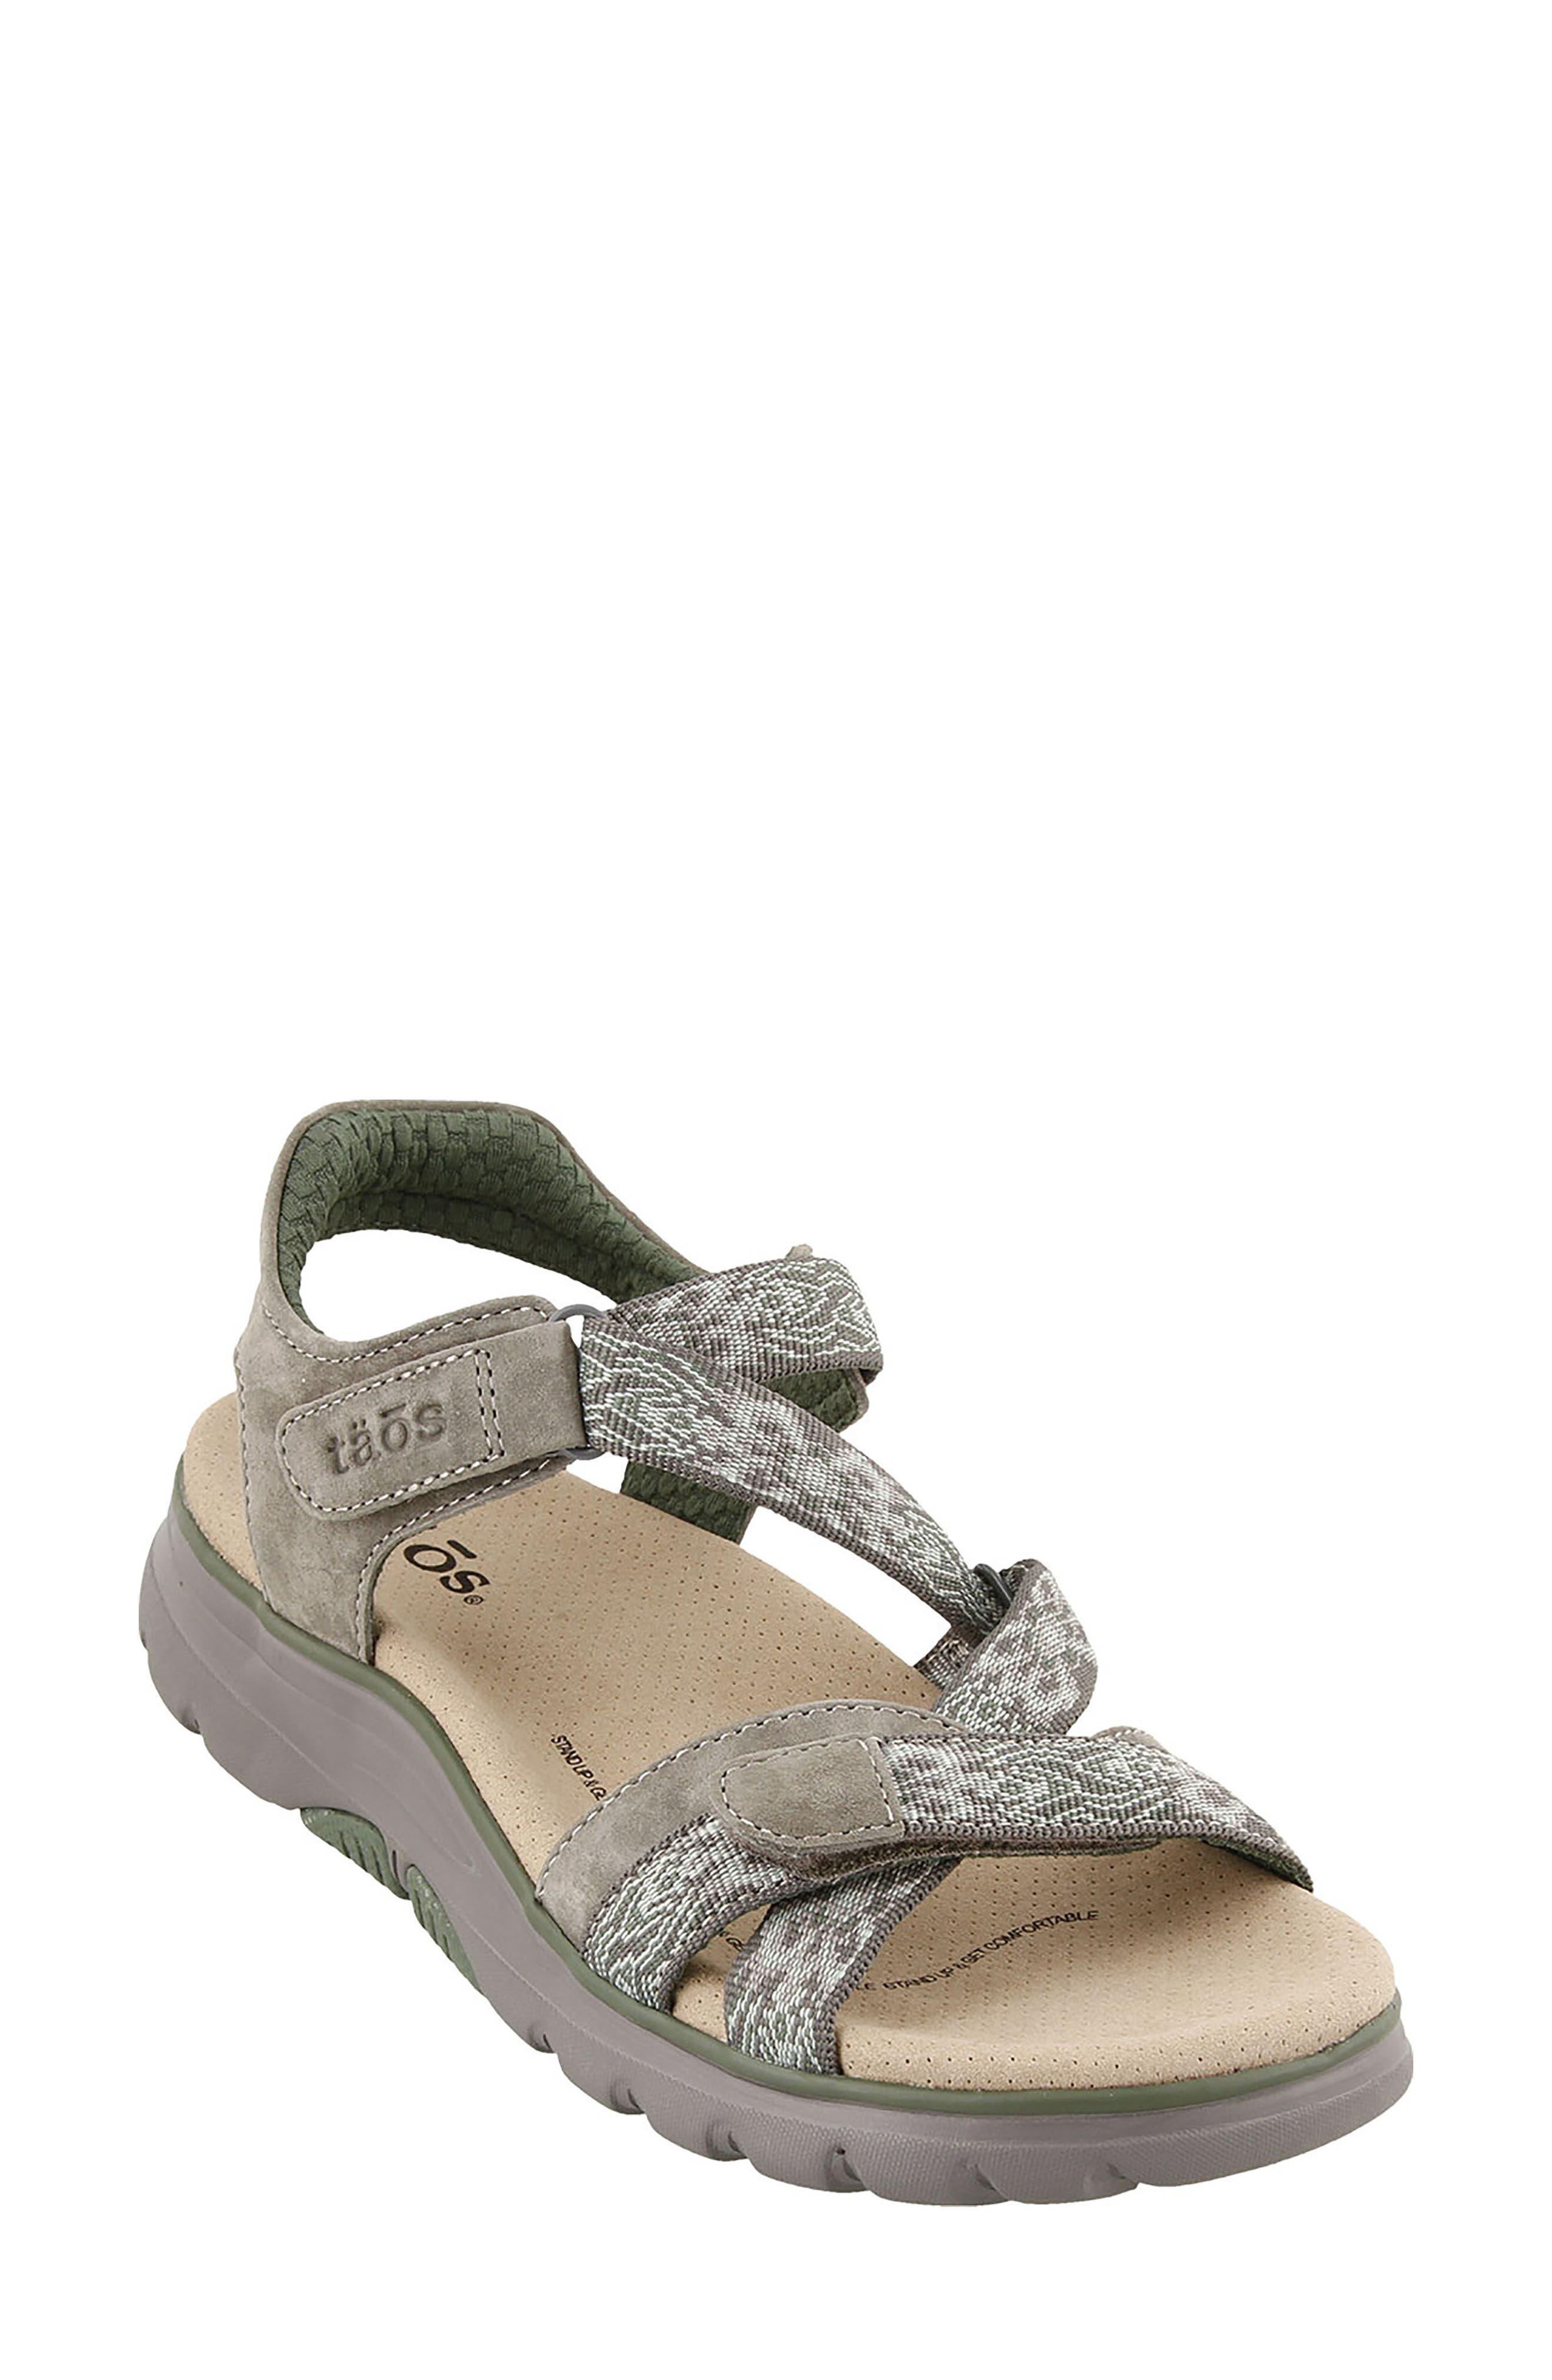 Zen Sandal,                         Main,                         color, GREY/ SAGE LEATHER